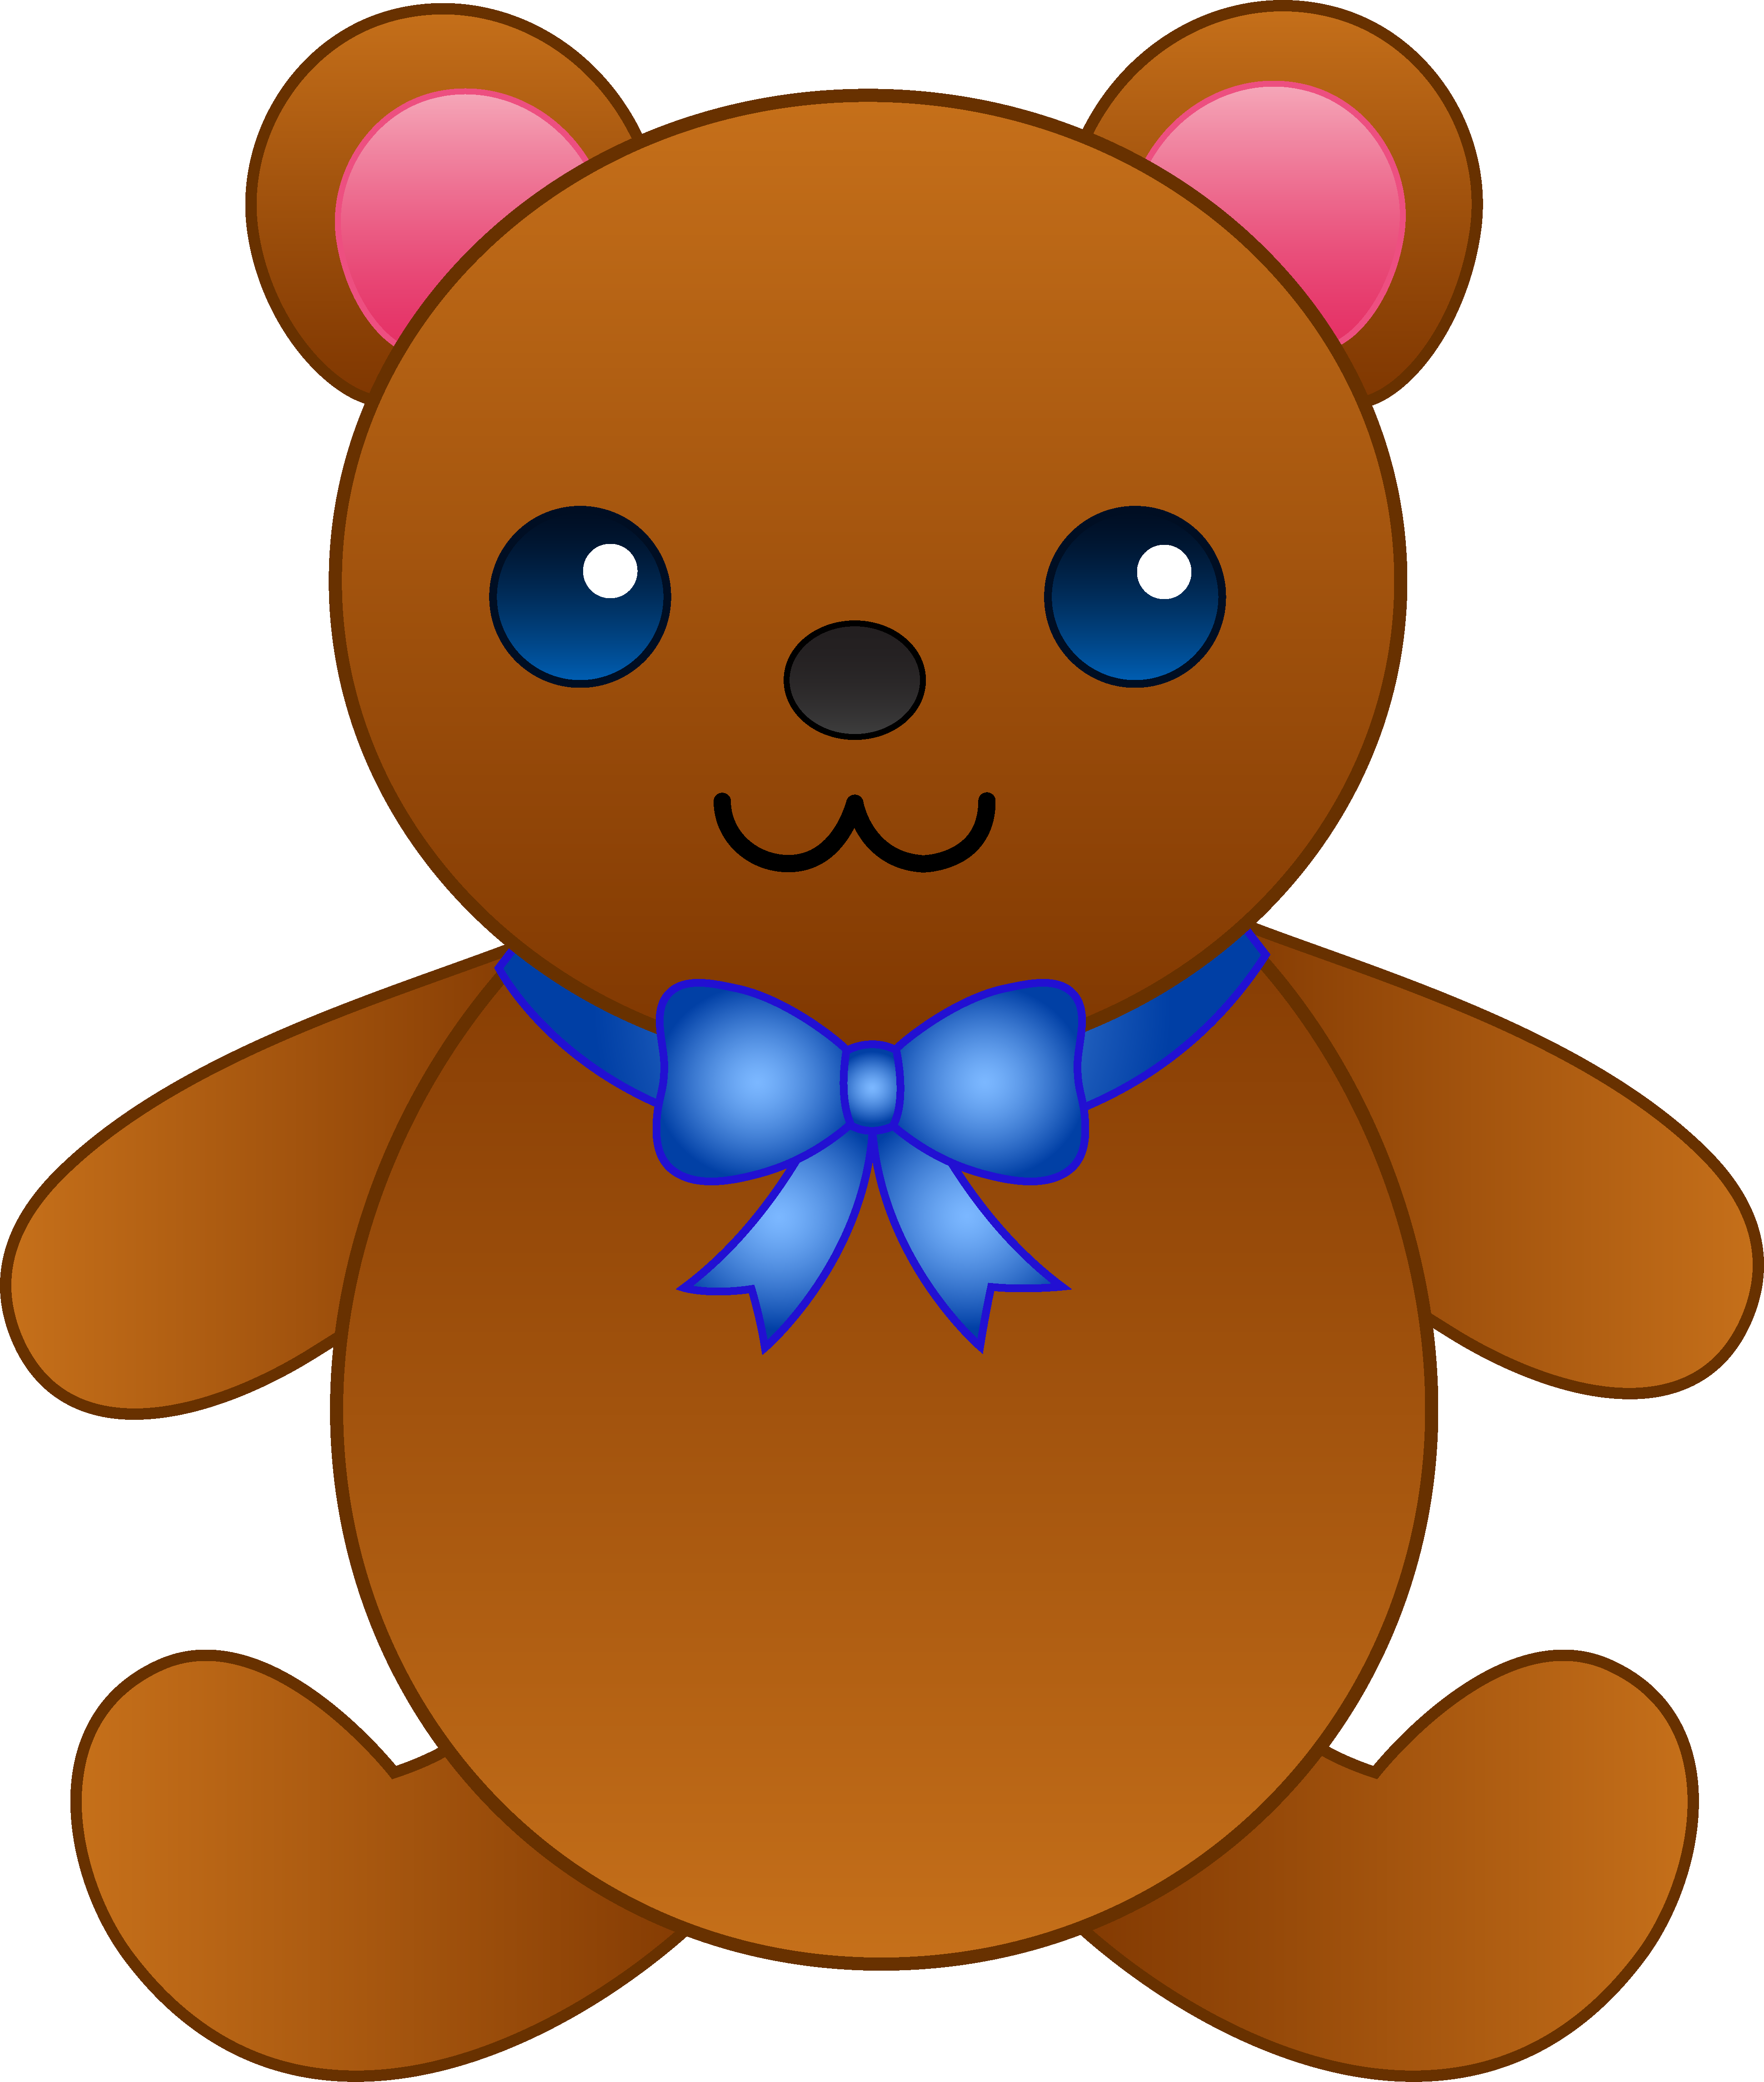 Clipart panda bow. Teddy bear creepy free